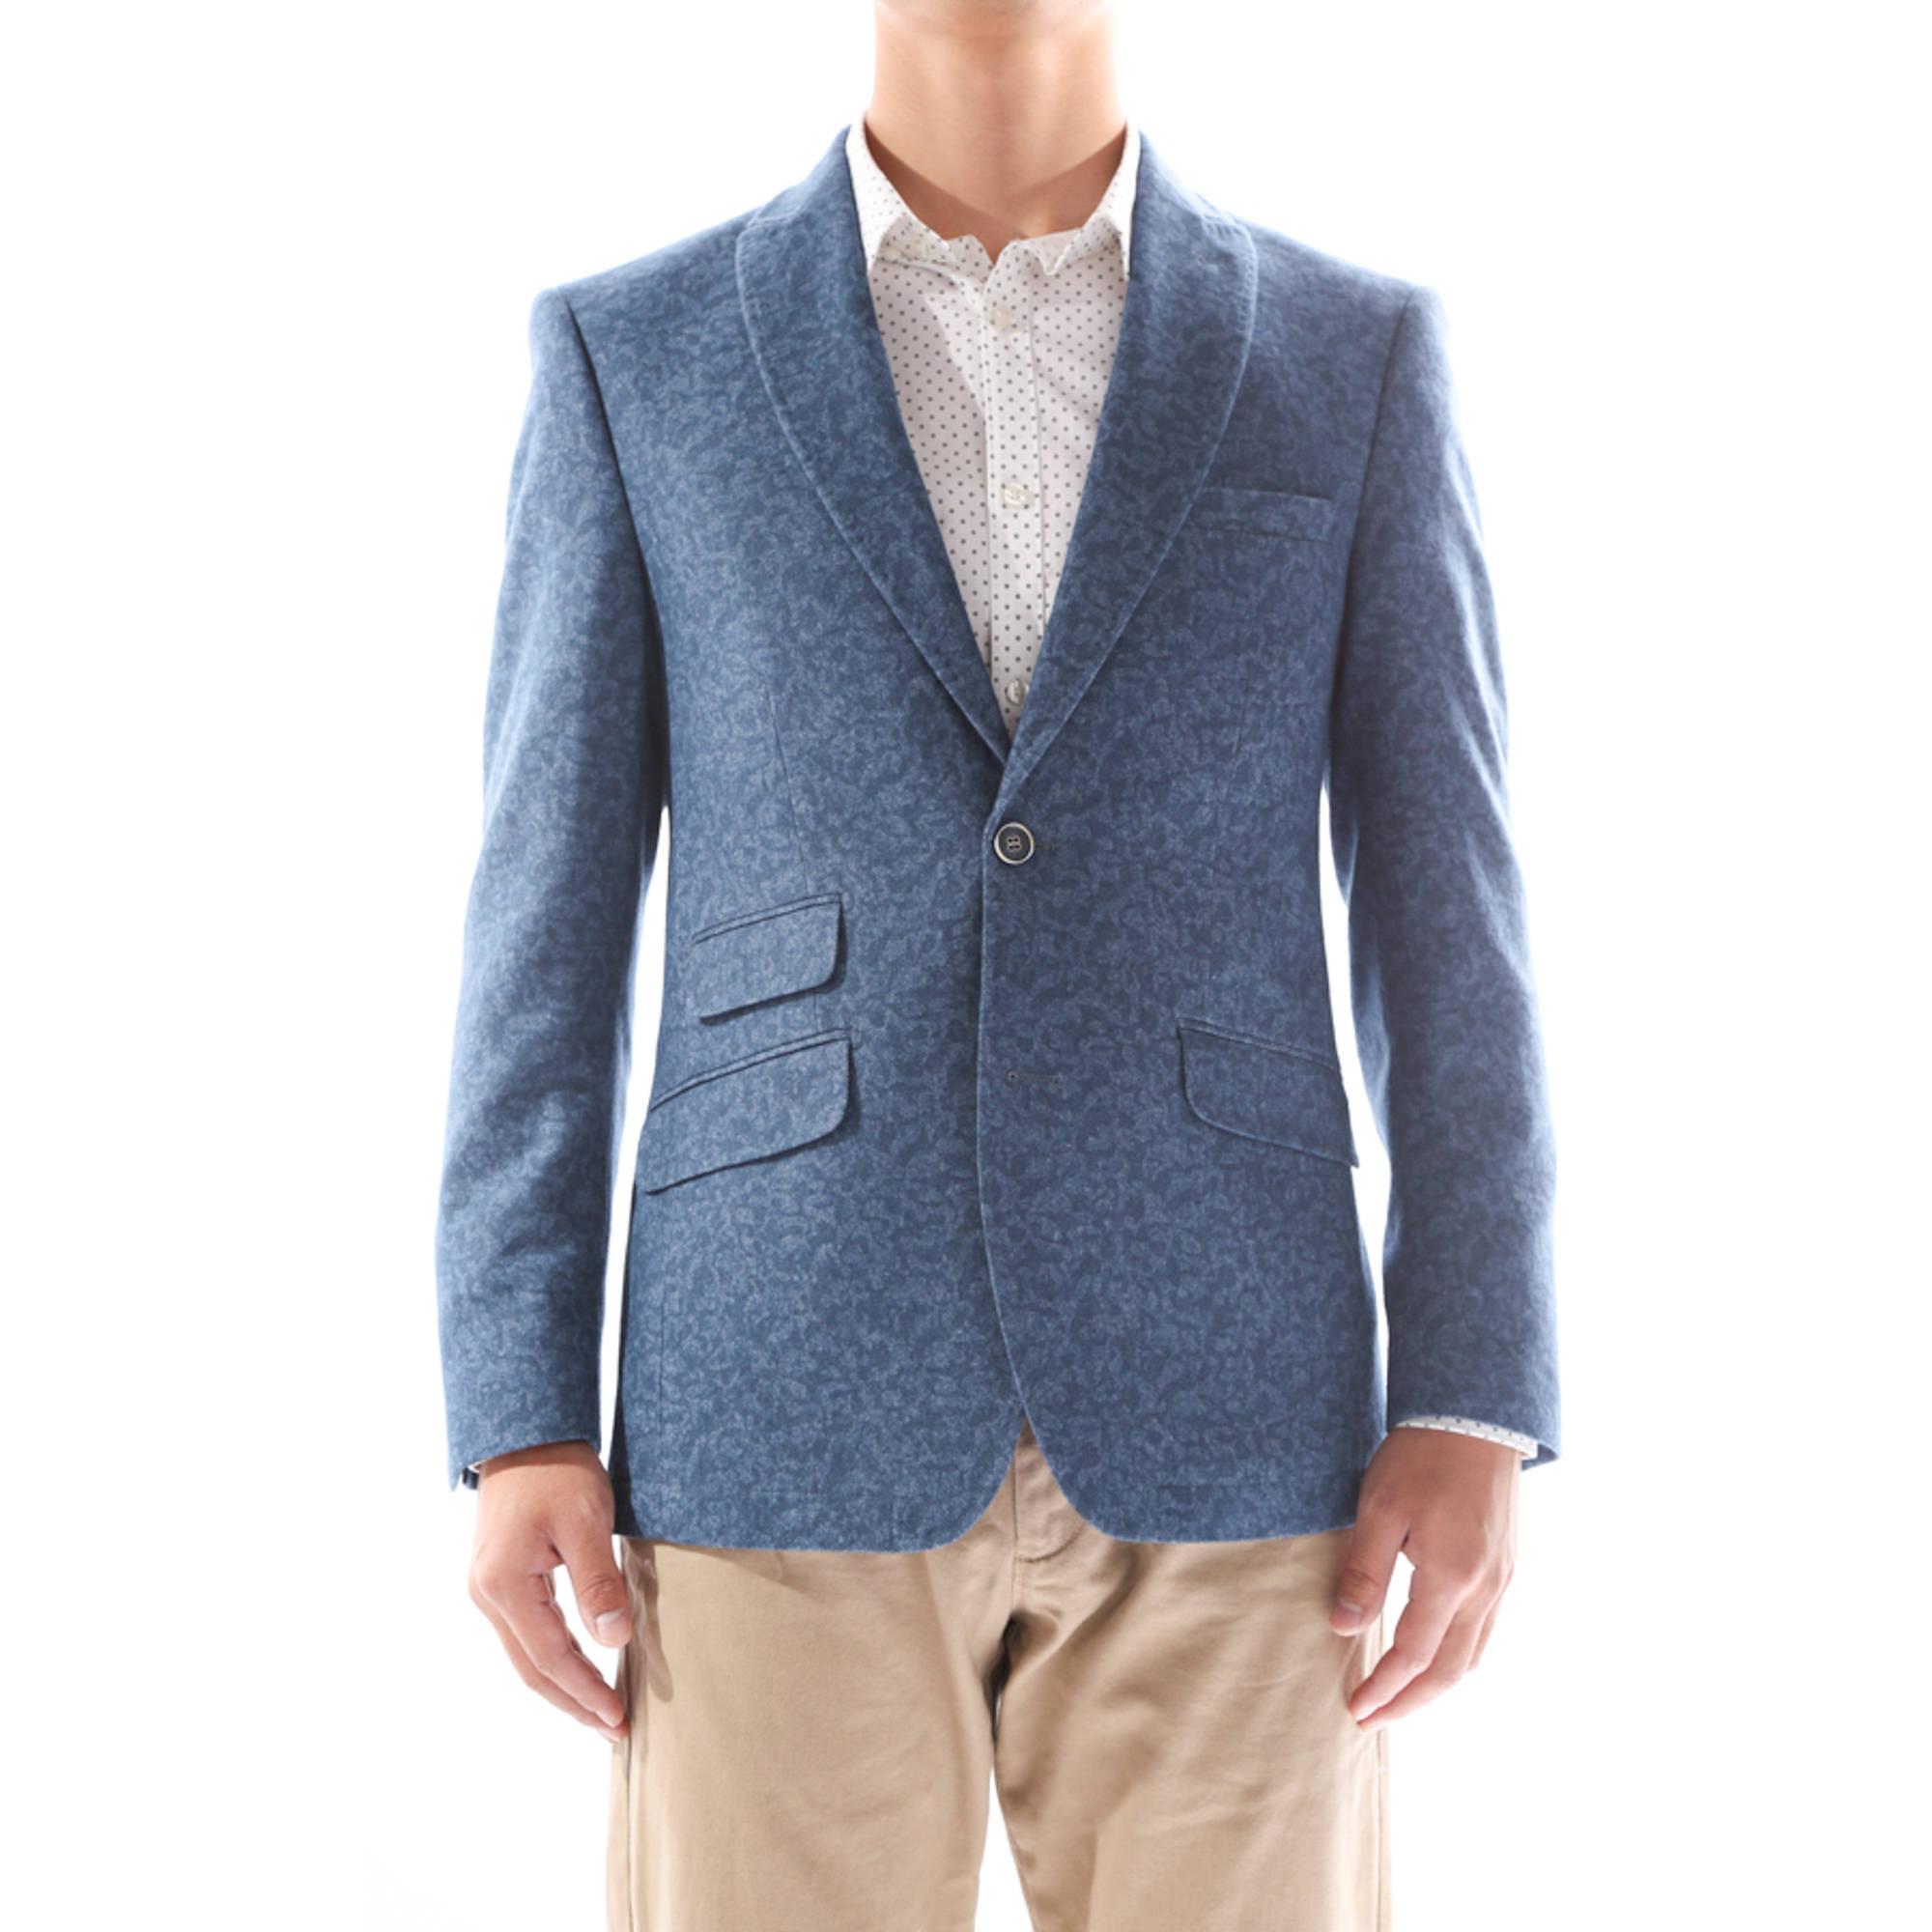 Verno Calvo Men's Blue Patterned Slim Fit Italian Styled Wool Blazer